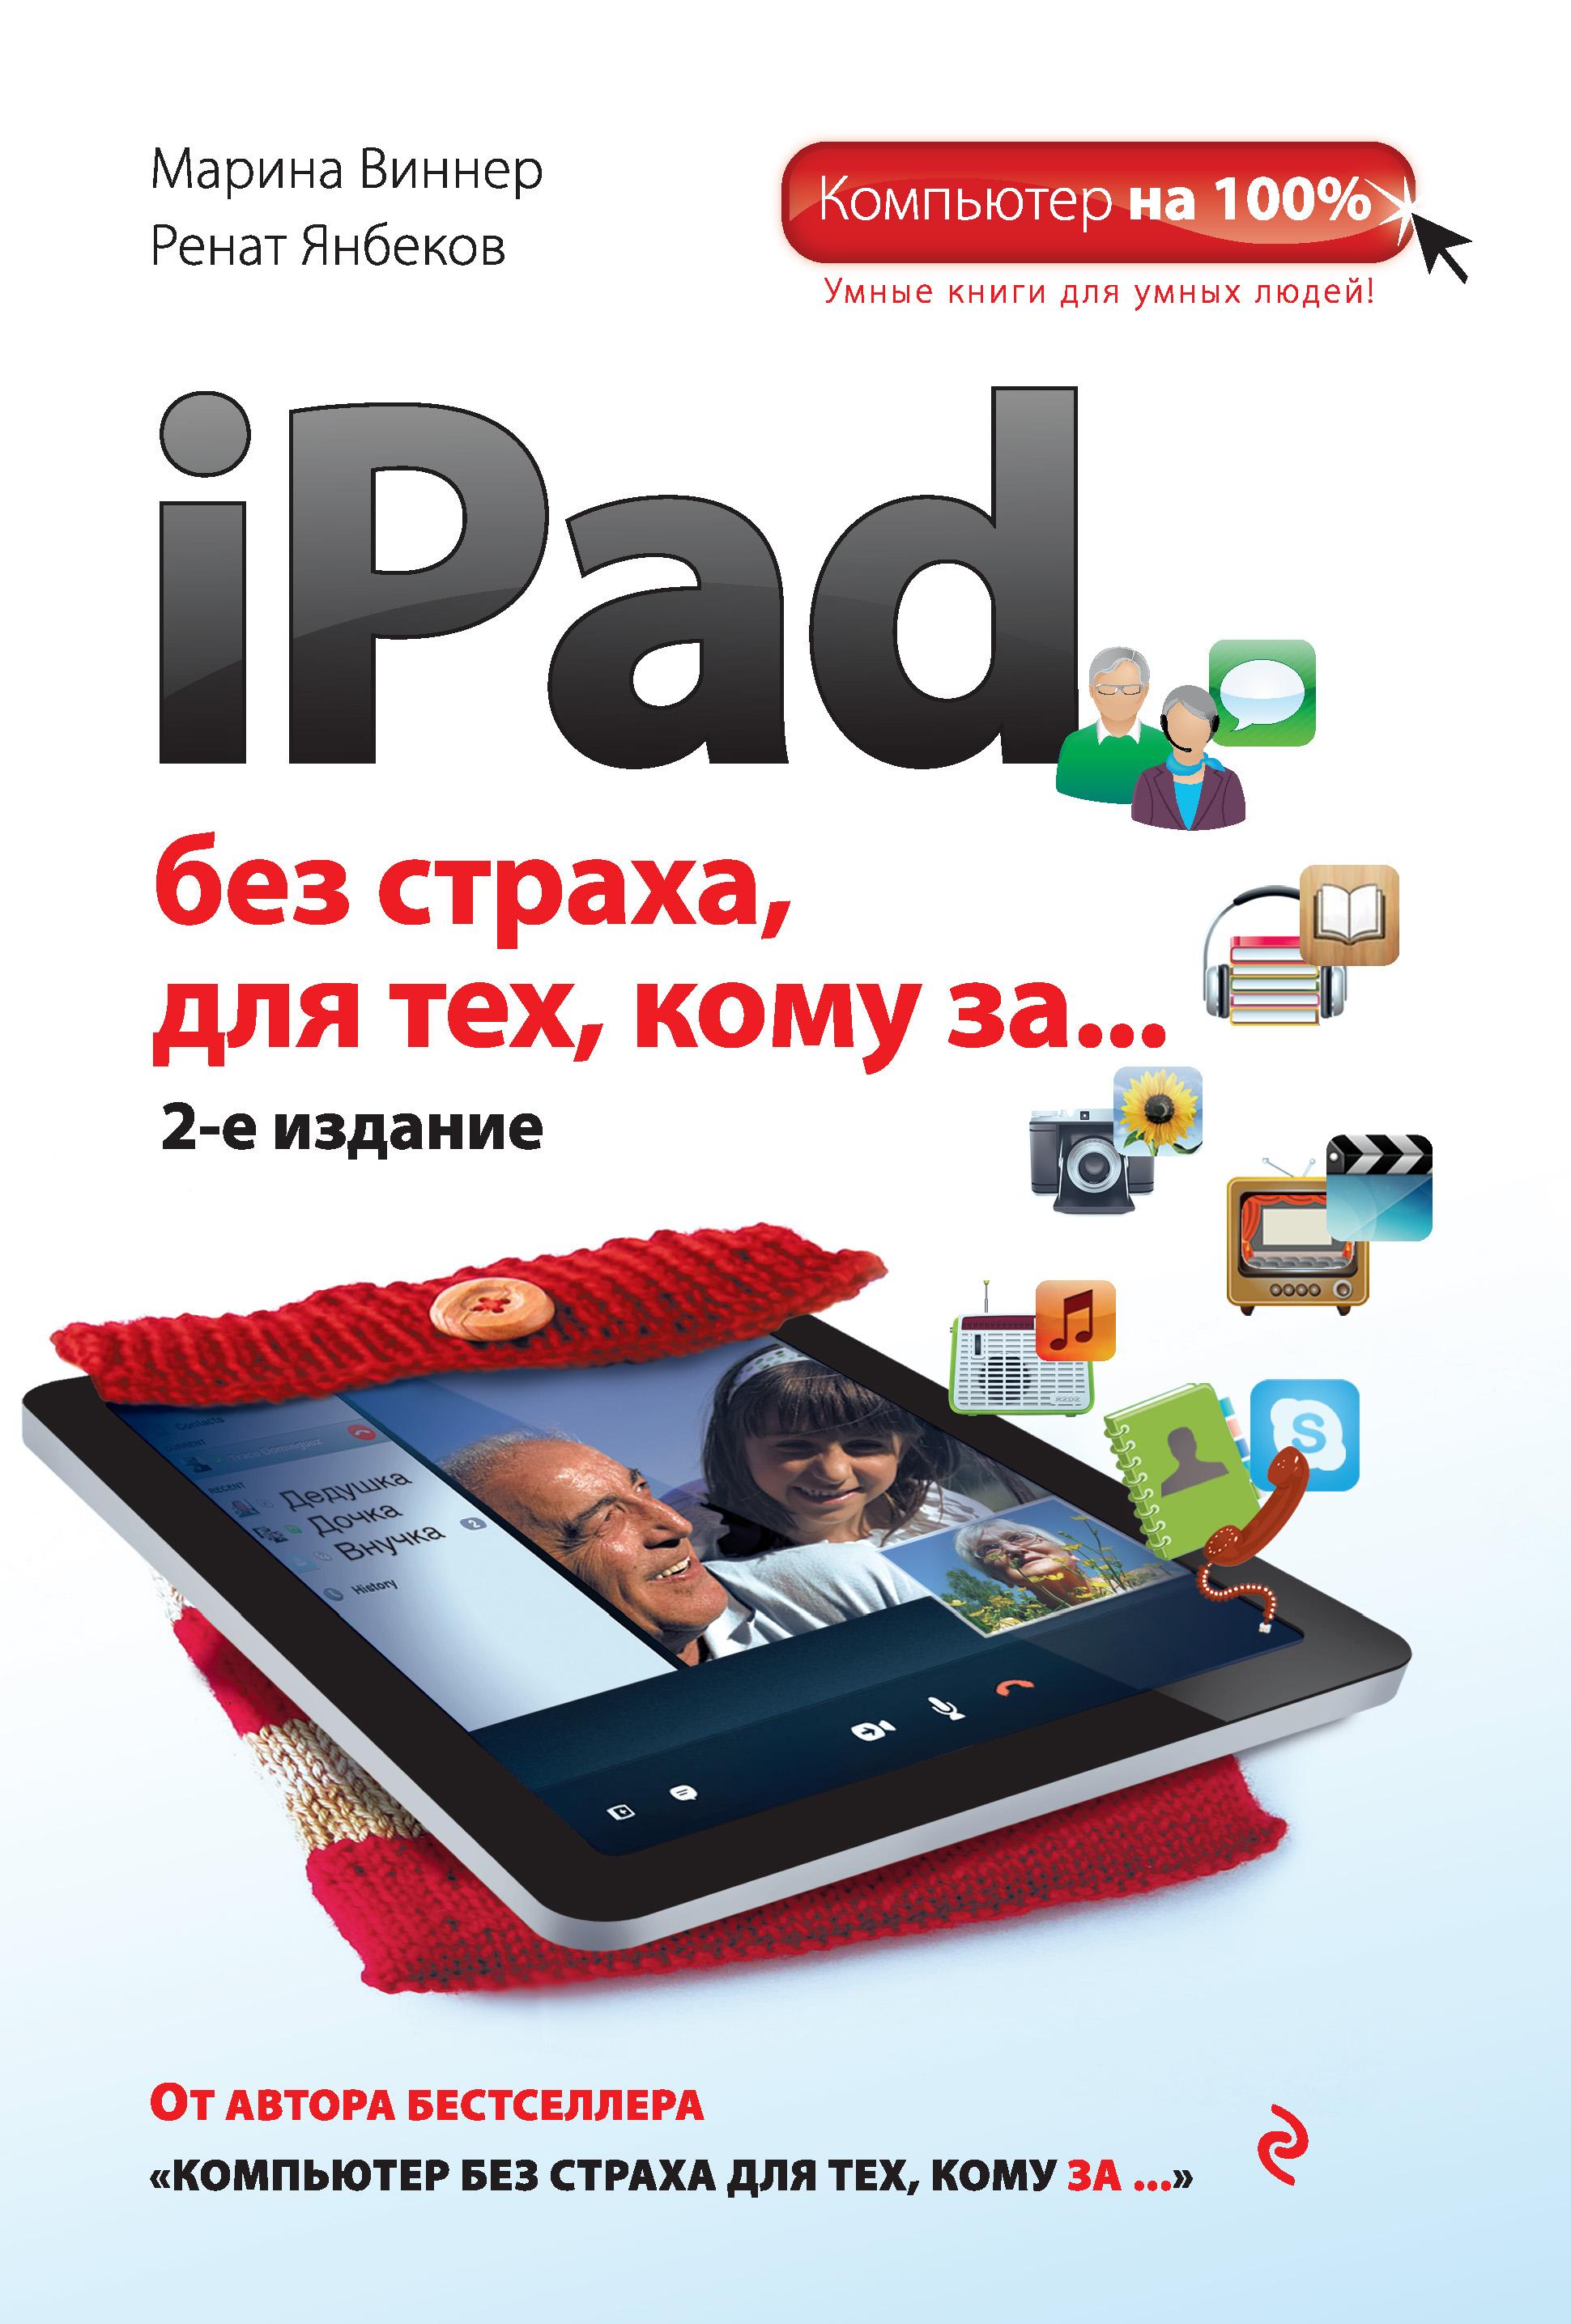 Марина Виннер iPad без страха для тех, кому за… марина виннер ренат янбеков ipad без страха для тех кому за